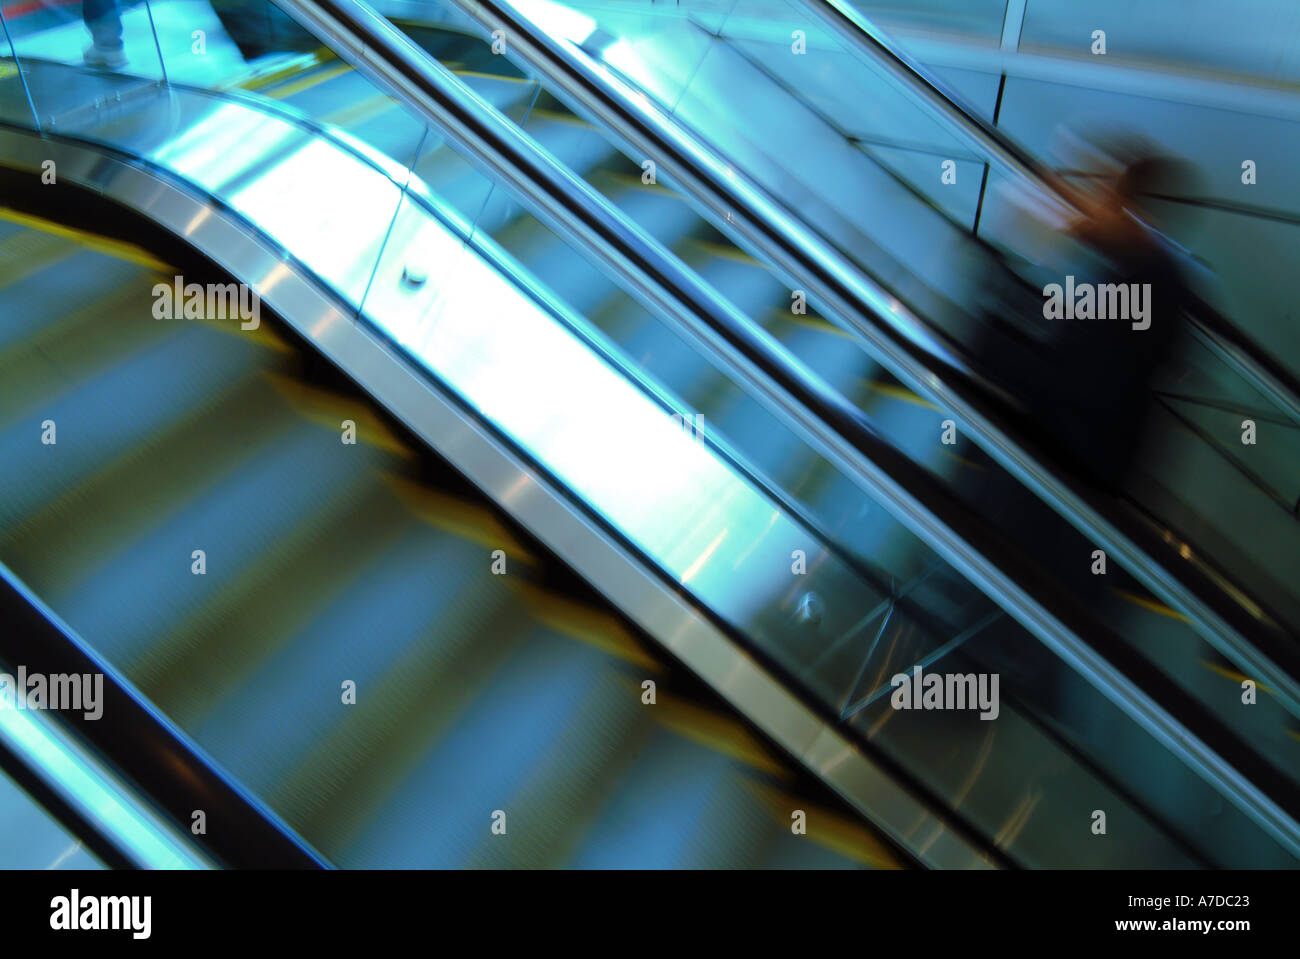 Escalator at the Minneapolis St Paul International airport - Stock Image